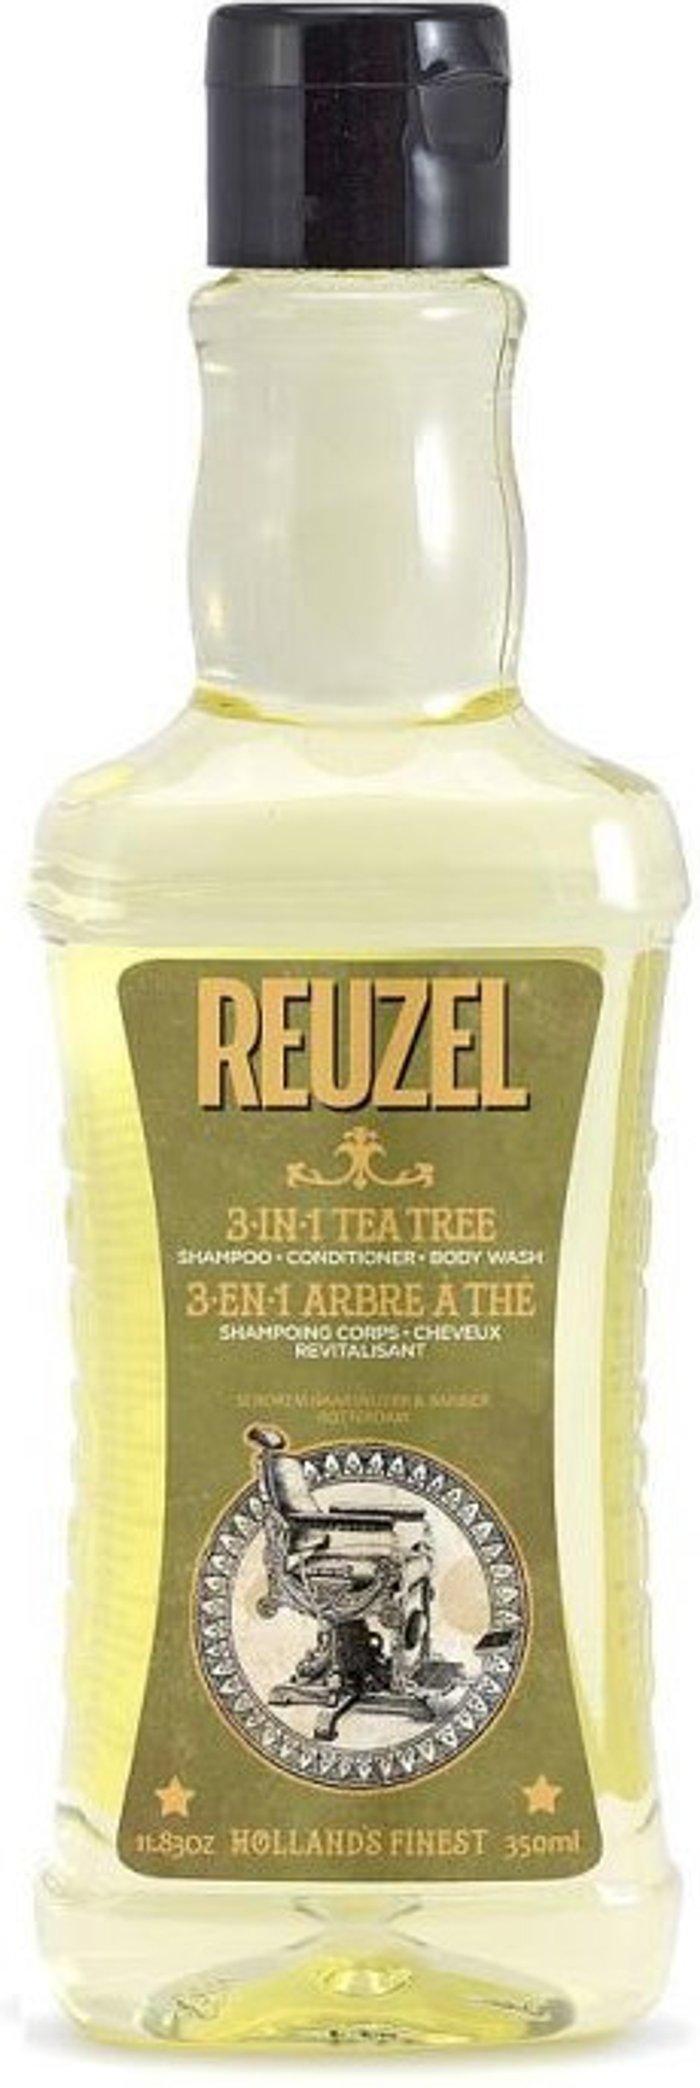 Reuzel Reuzel 3-in-1 Tea Tree Shampoo (350ml)